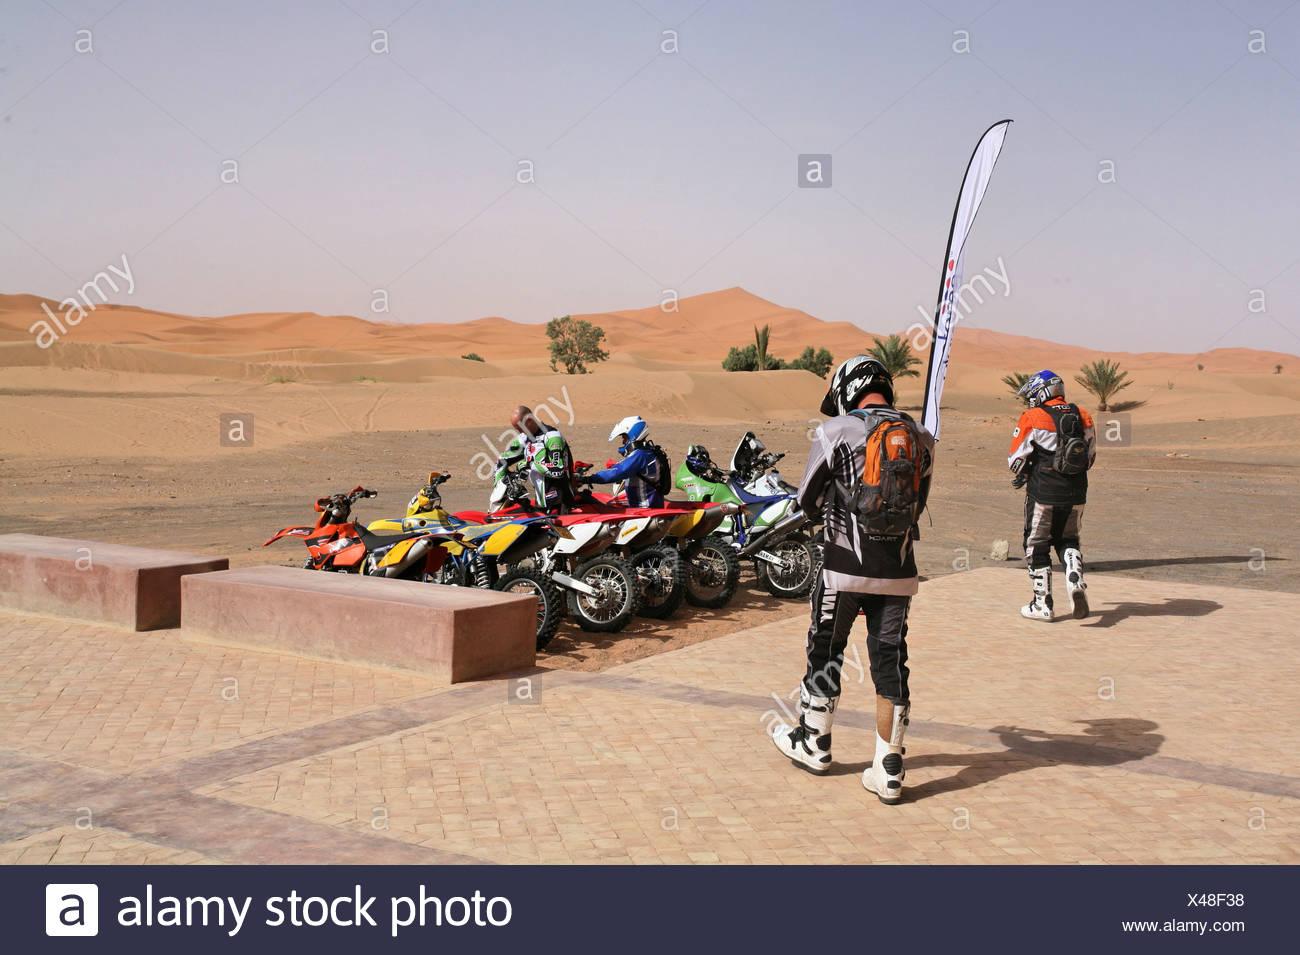 Motor Sport moto cross Enduro Motos motocicletas Motrrad aventura desierto Sahara Merzouga Marruecos Africa Imagen De Stock